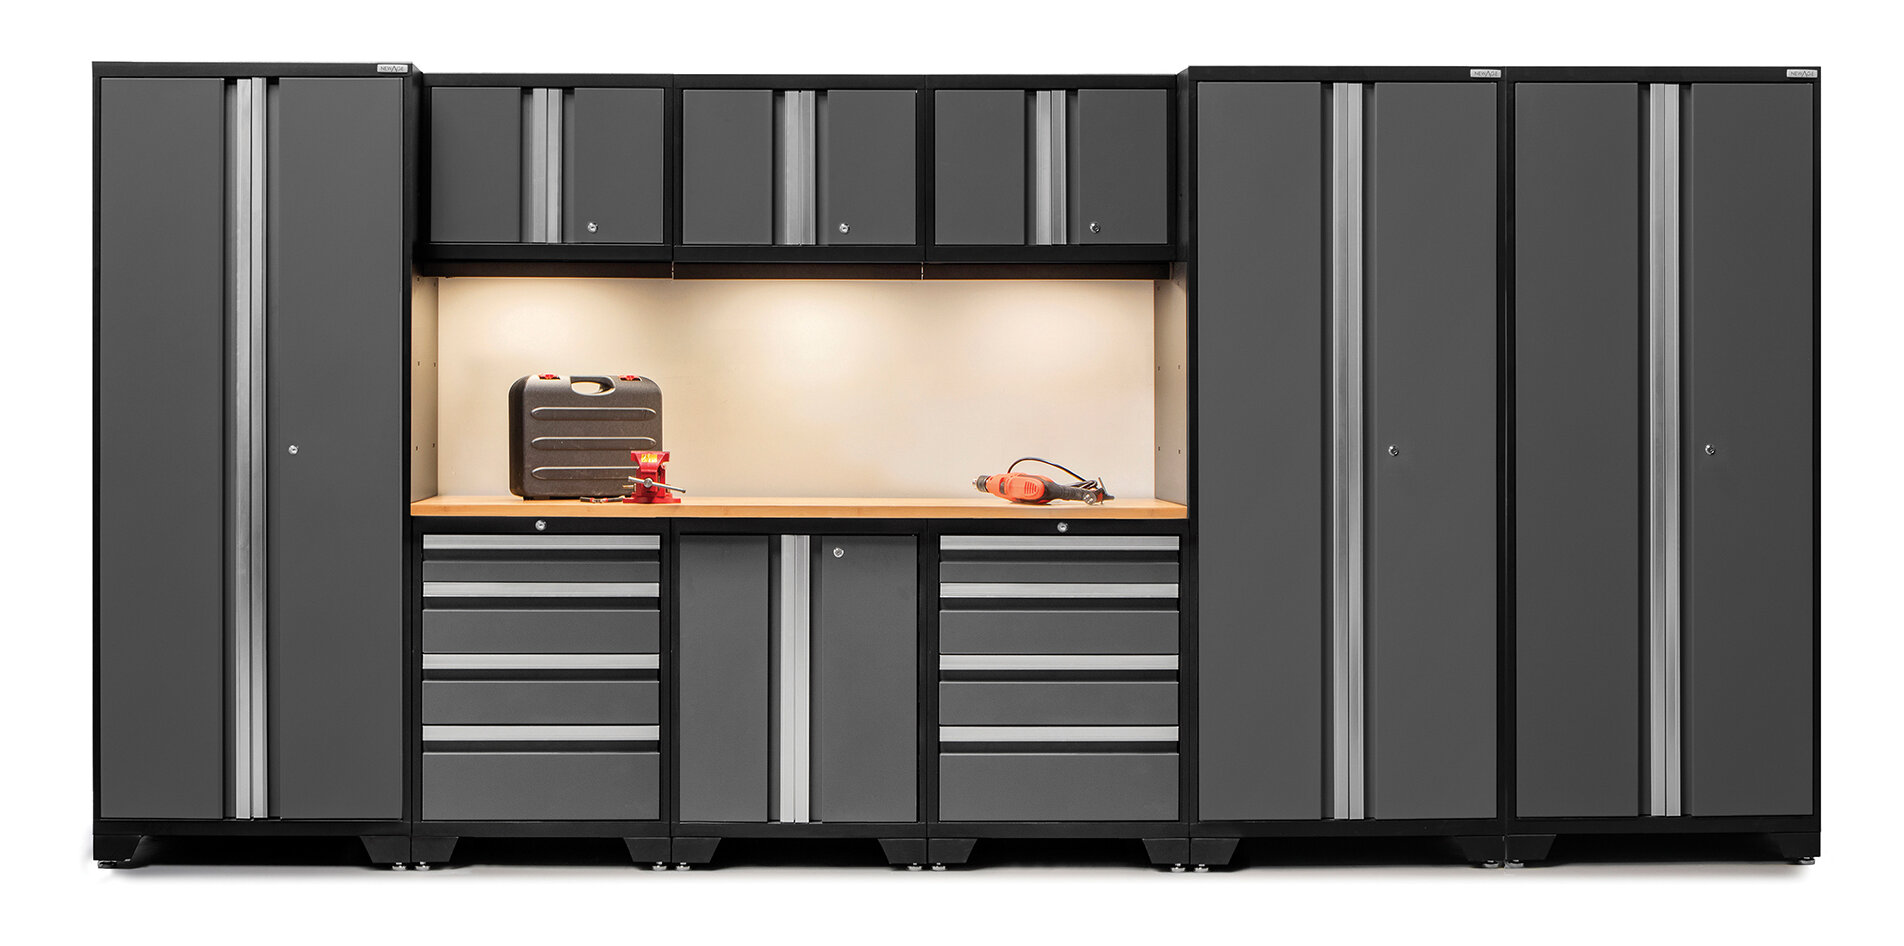 NewAge Products Bold 3 0 Series 10 Piece Garage Storage Cabinet Set with  Worktop. Garage Cabinets   New  Used  Storage  Metal  Wall   eBay